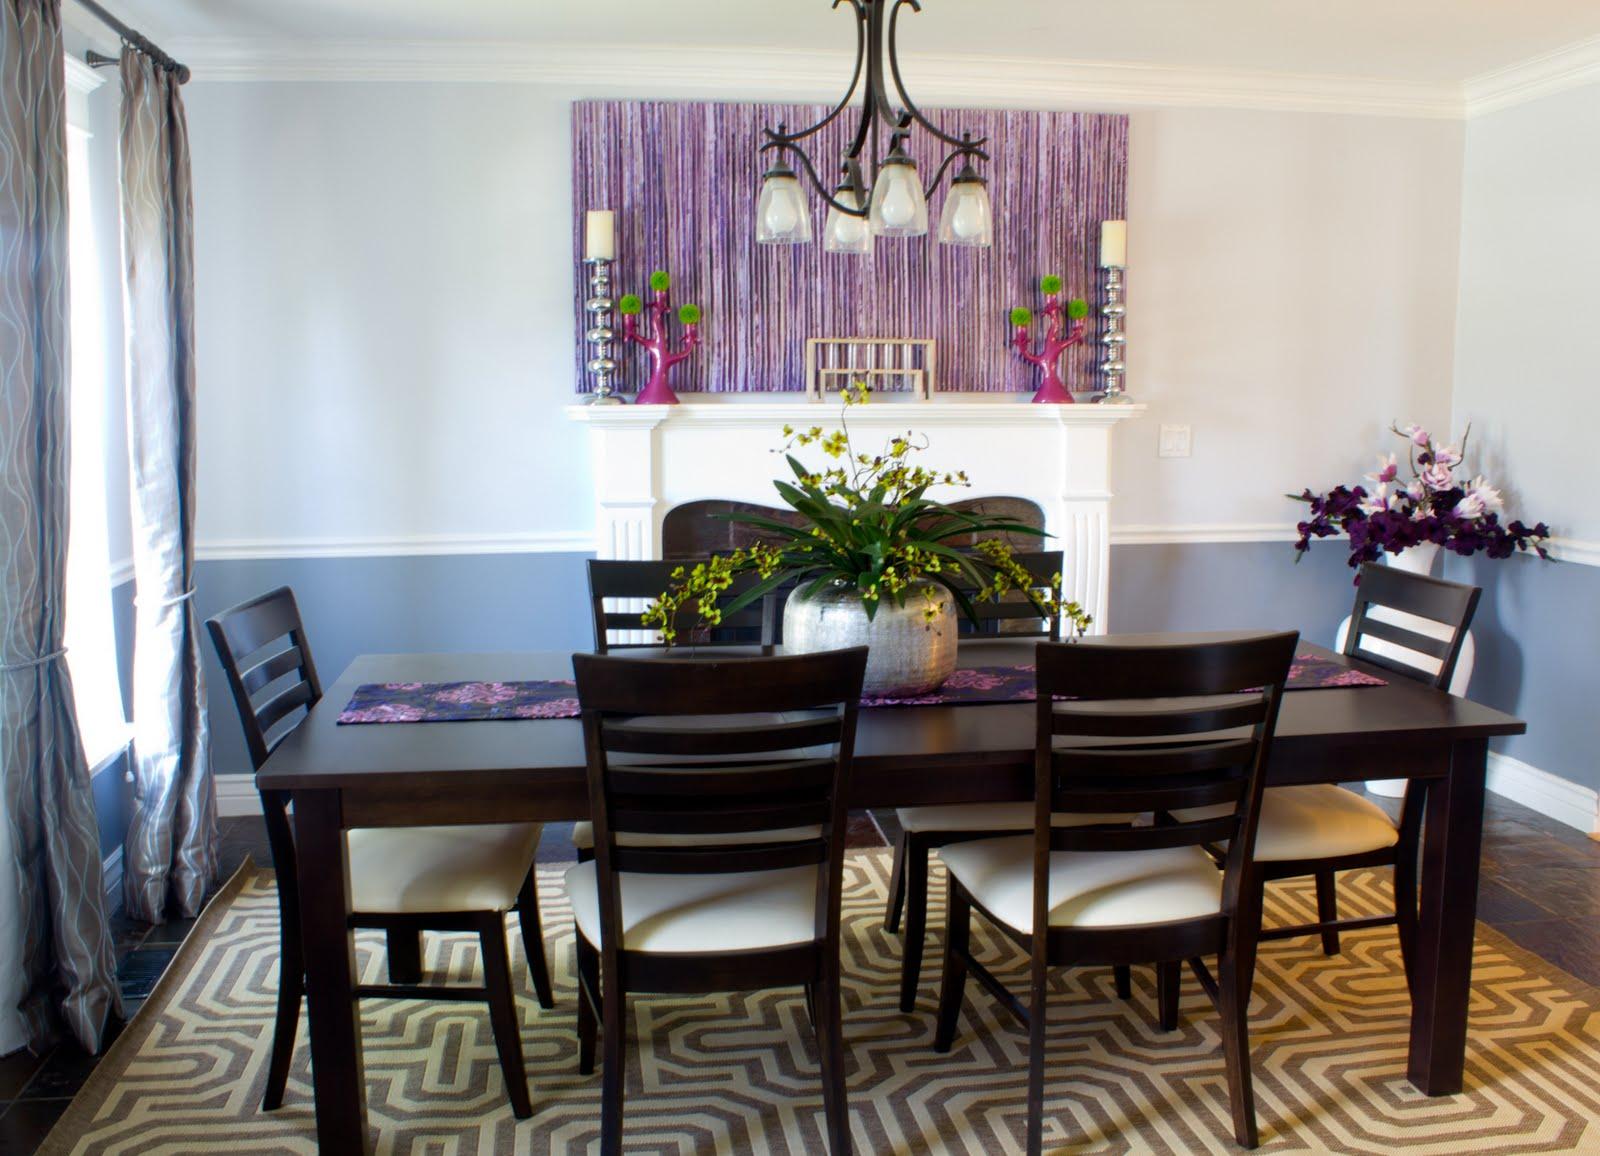 The Design House Interior Design: A Pleasantly Purple